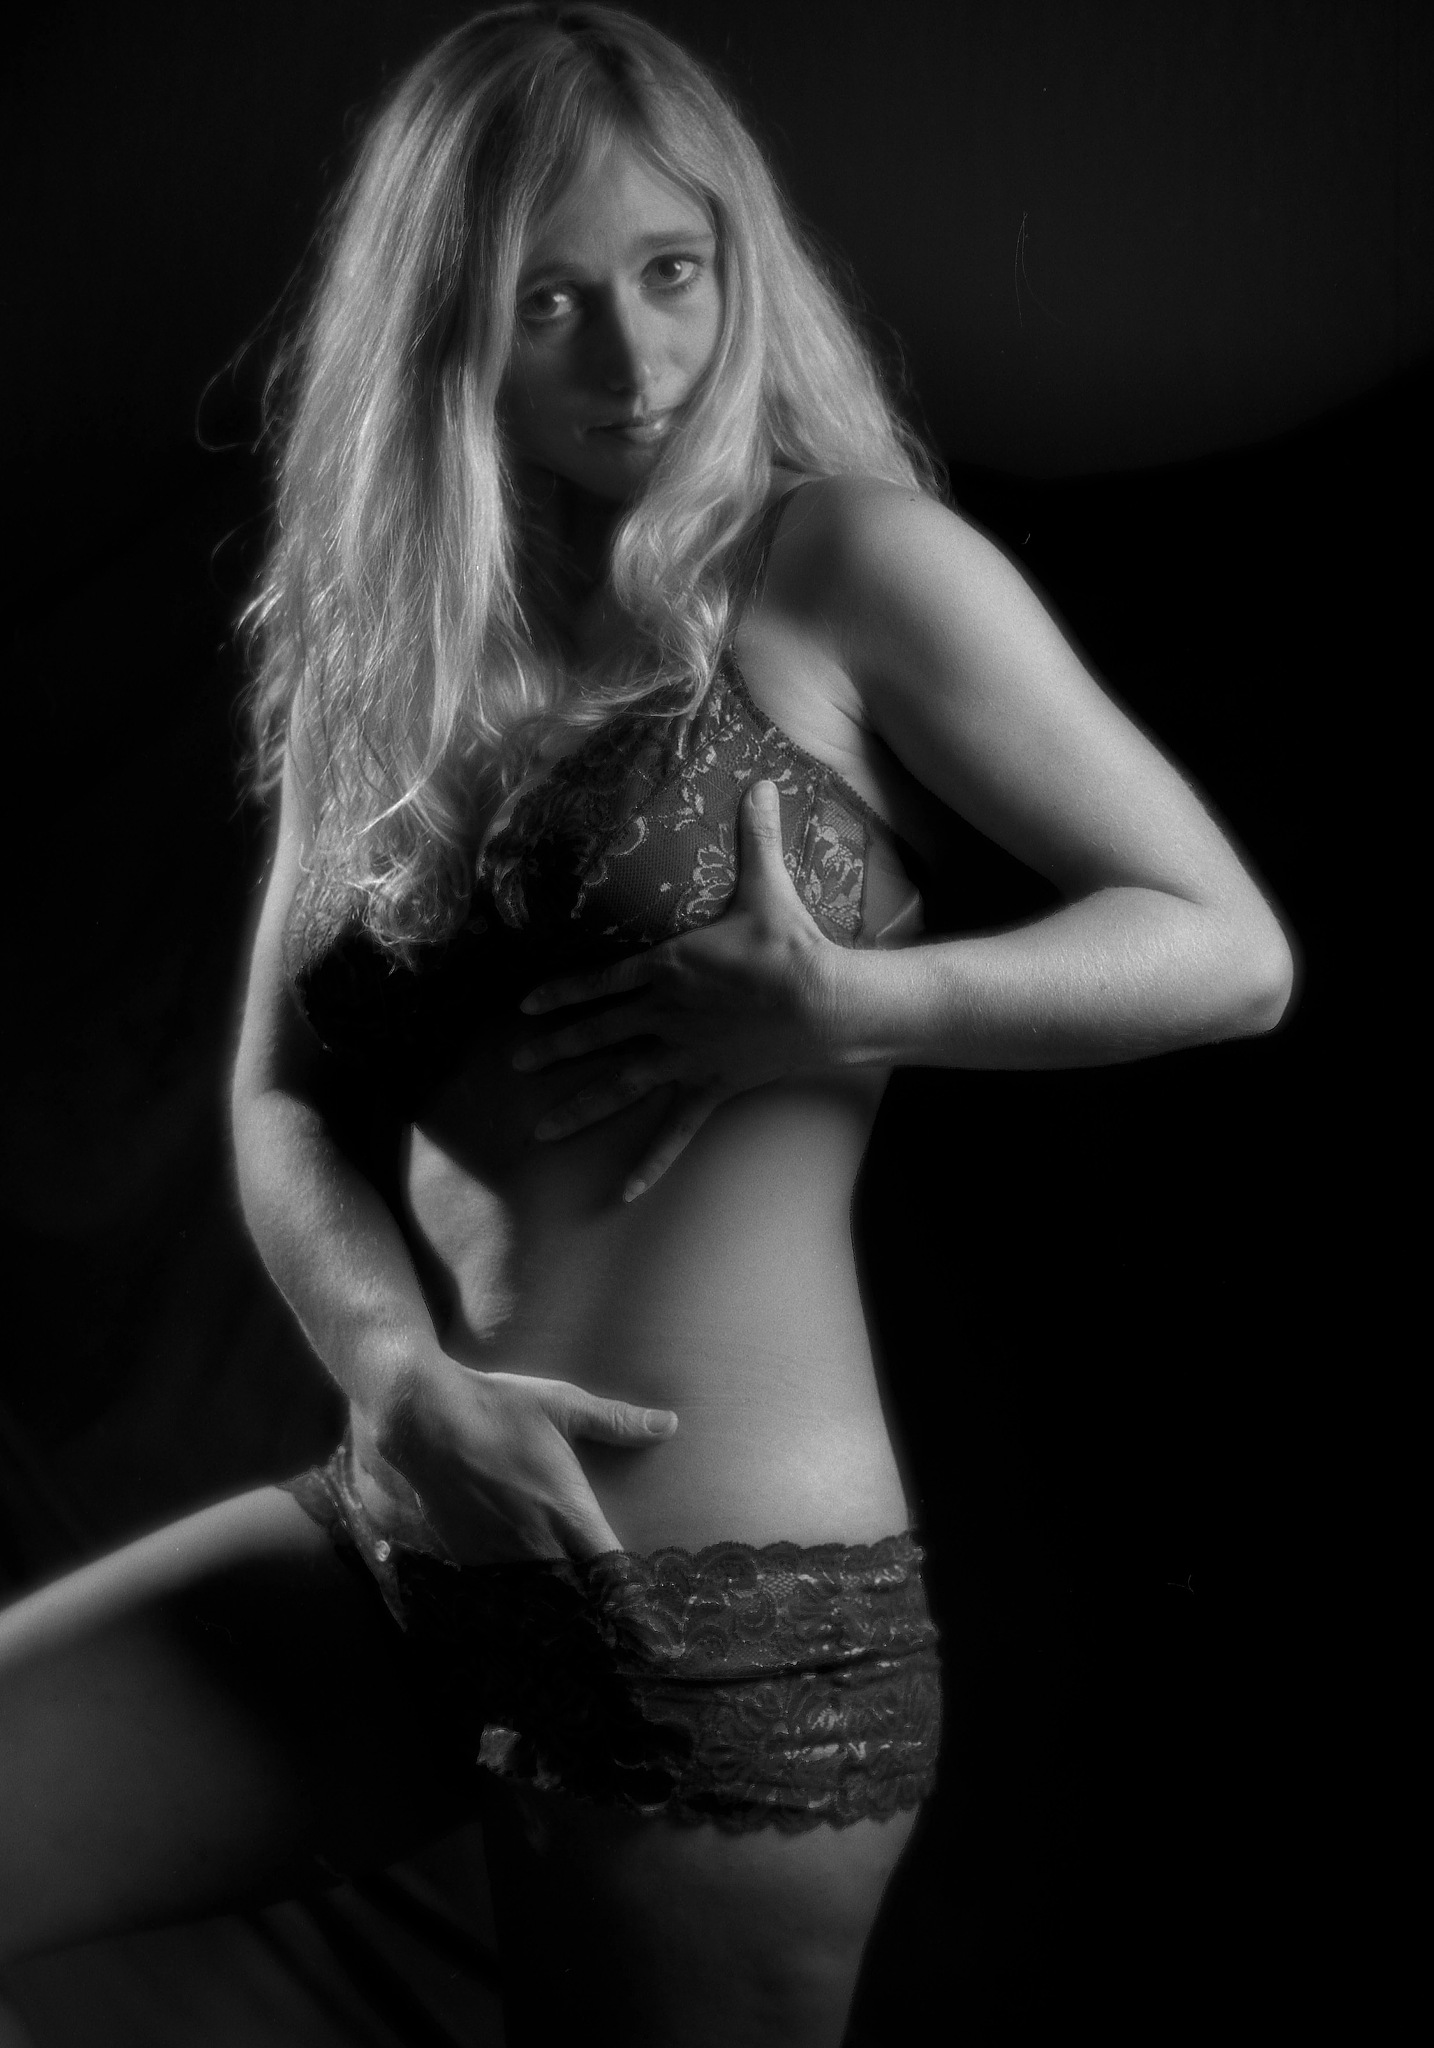 Sexy blonde by Pixforce